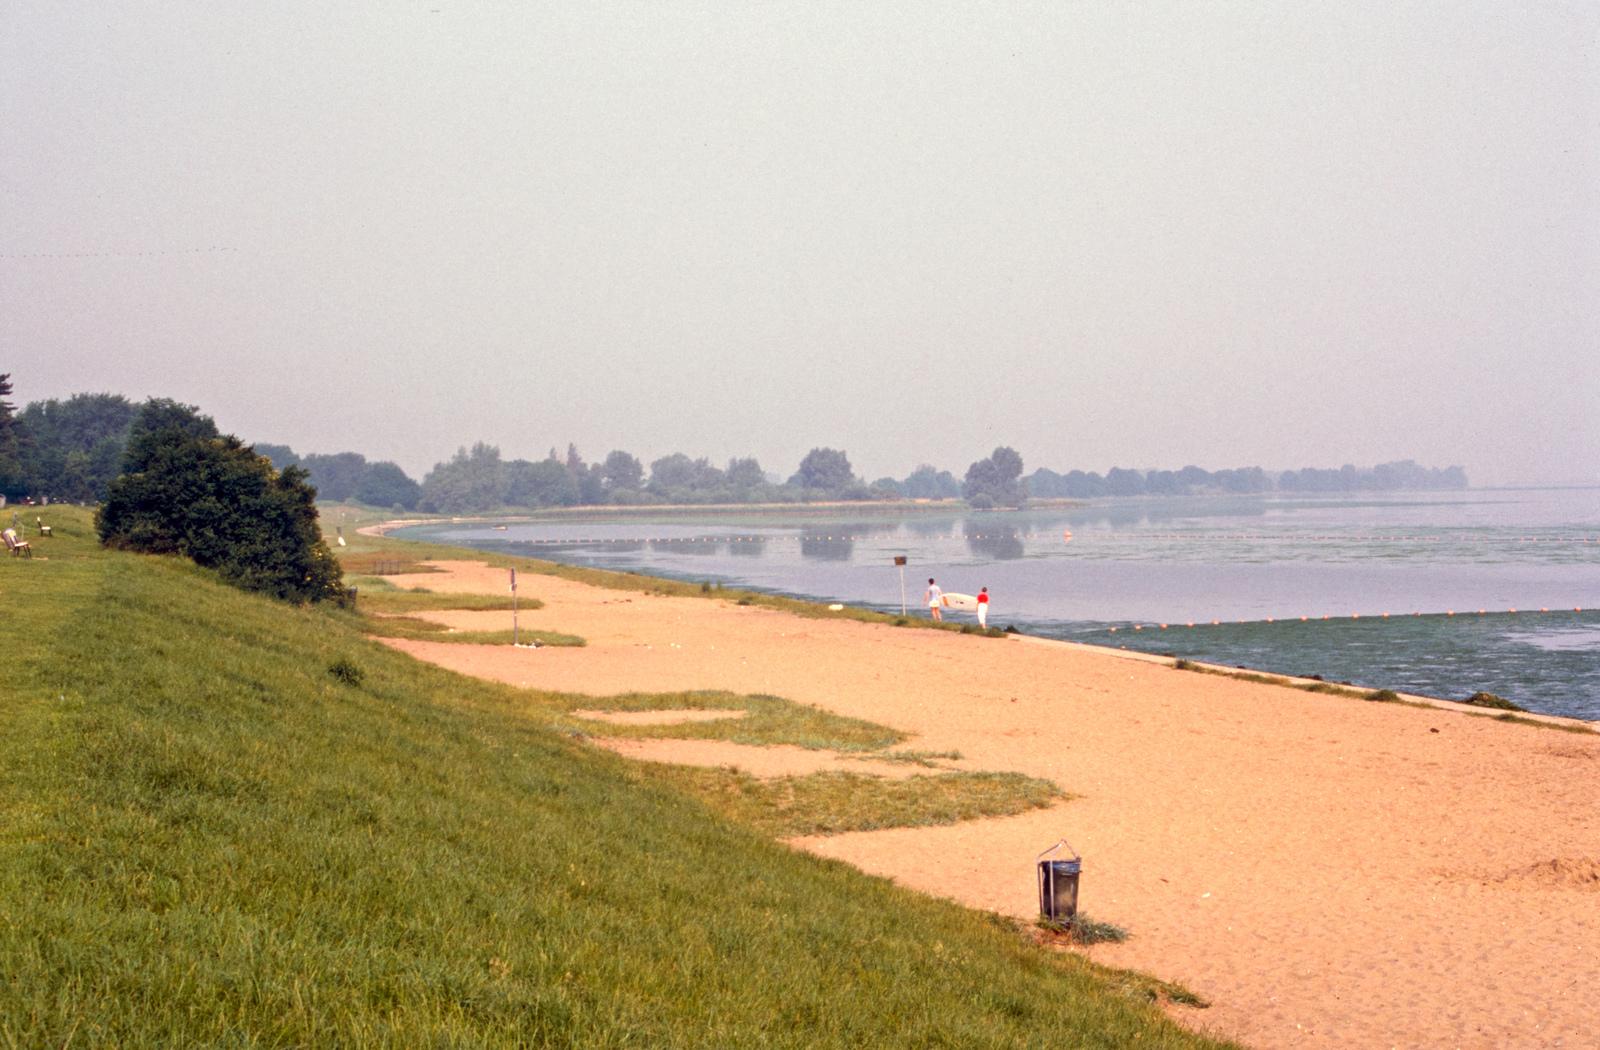 Het strand van Muiderberg